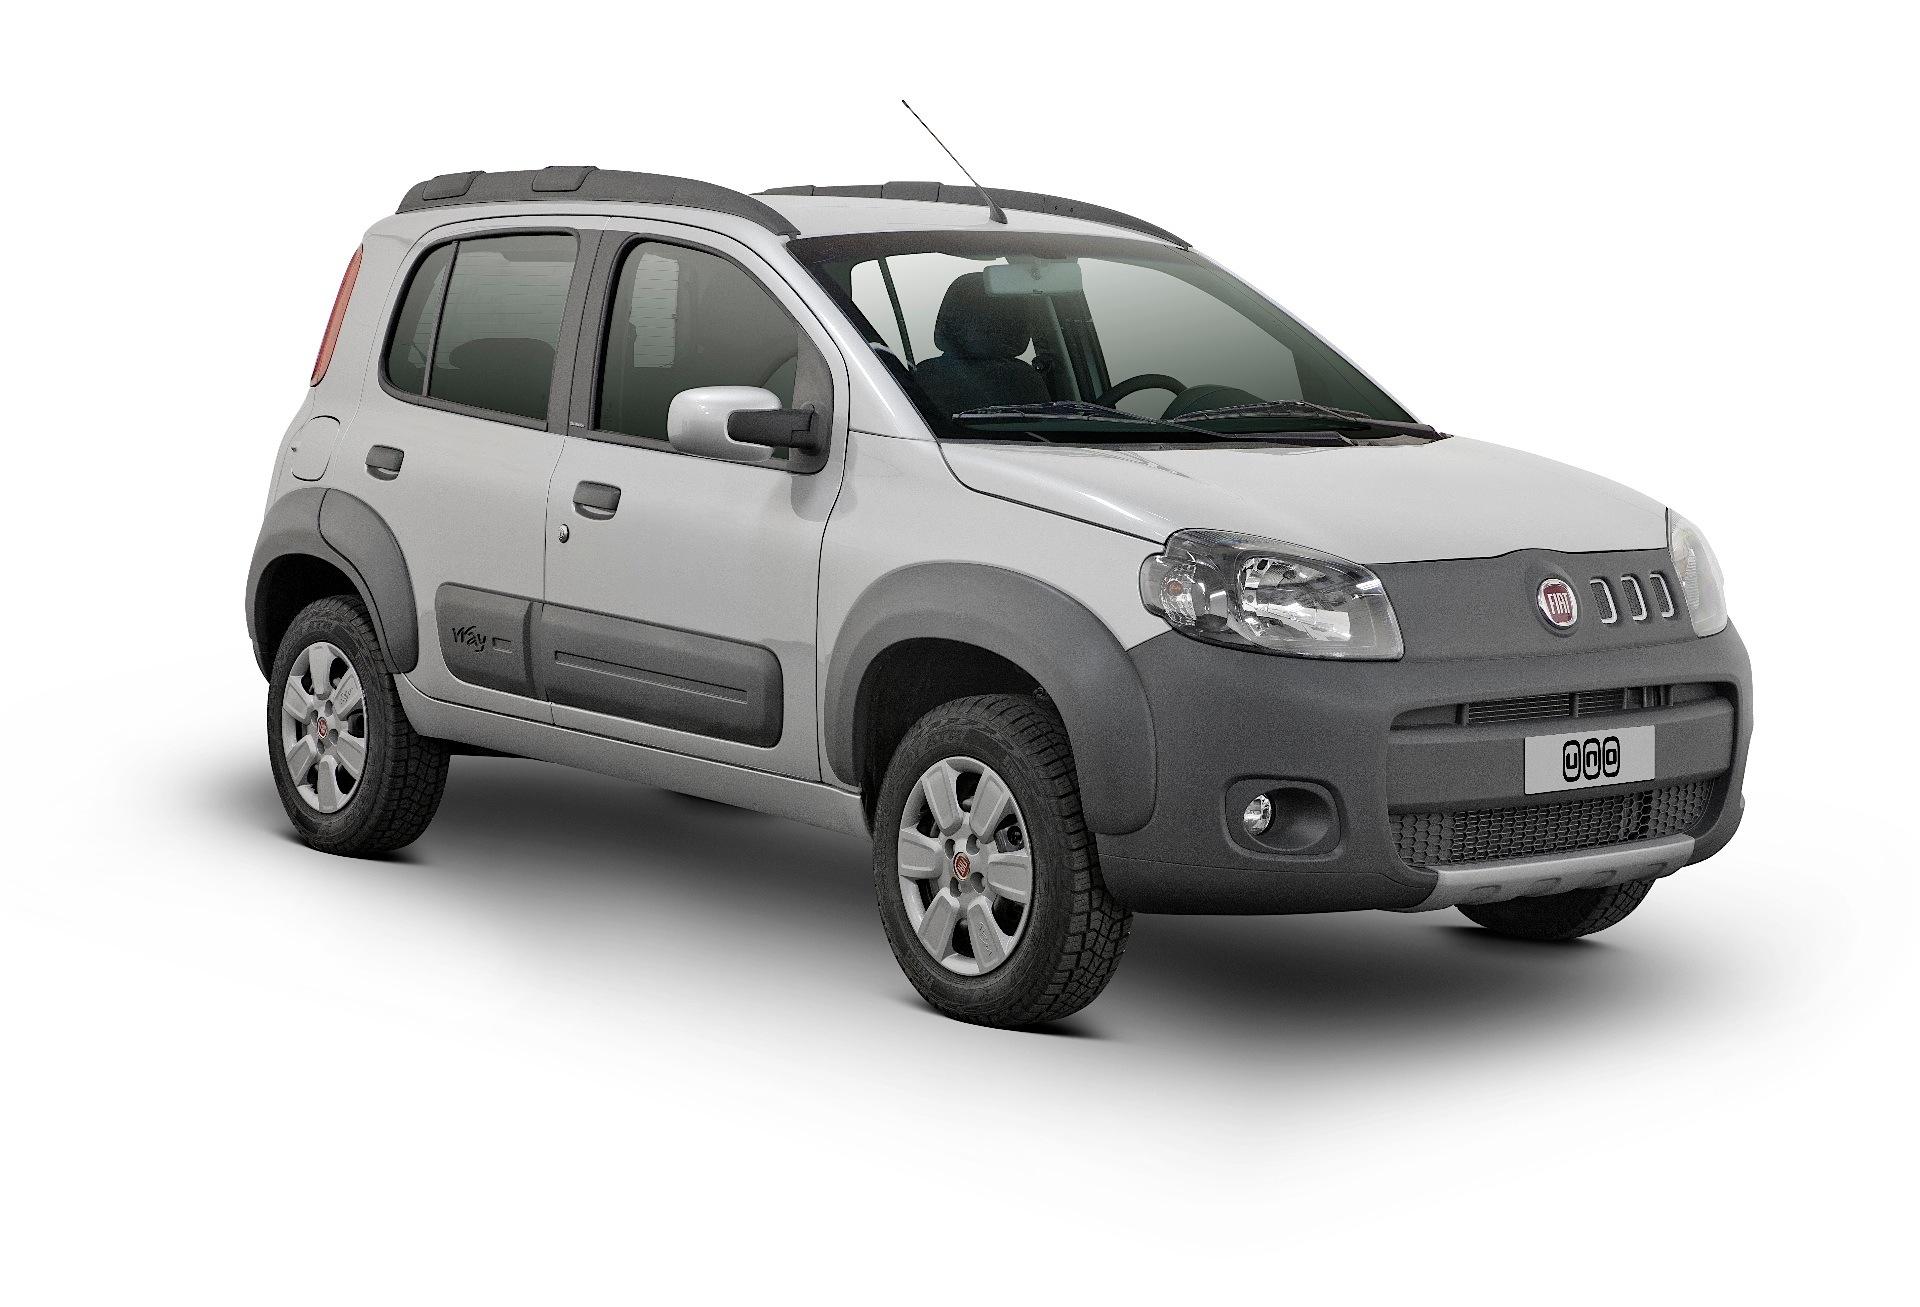 Fiat Uno Specs 2010 2011 2012 2013 2014 2015 2016